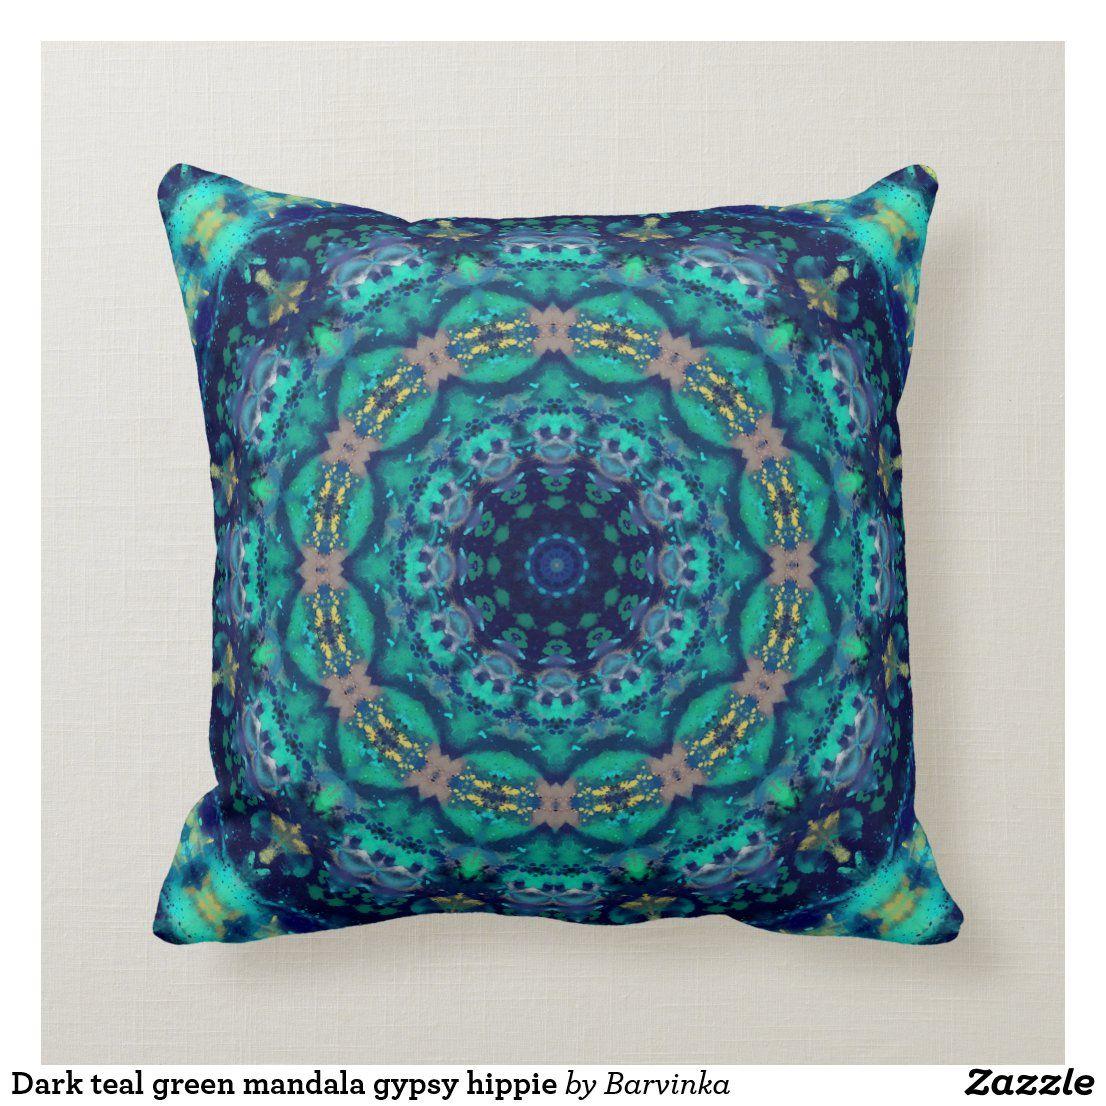 Dark teal green mandala gypsy hippie throw pillow